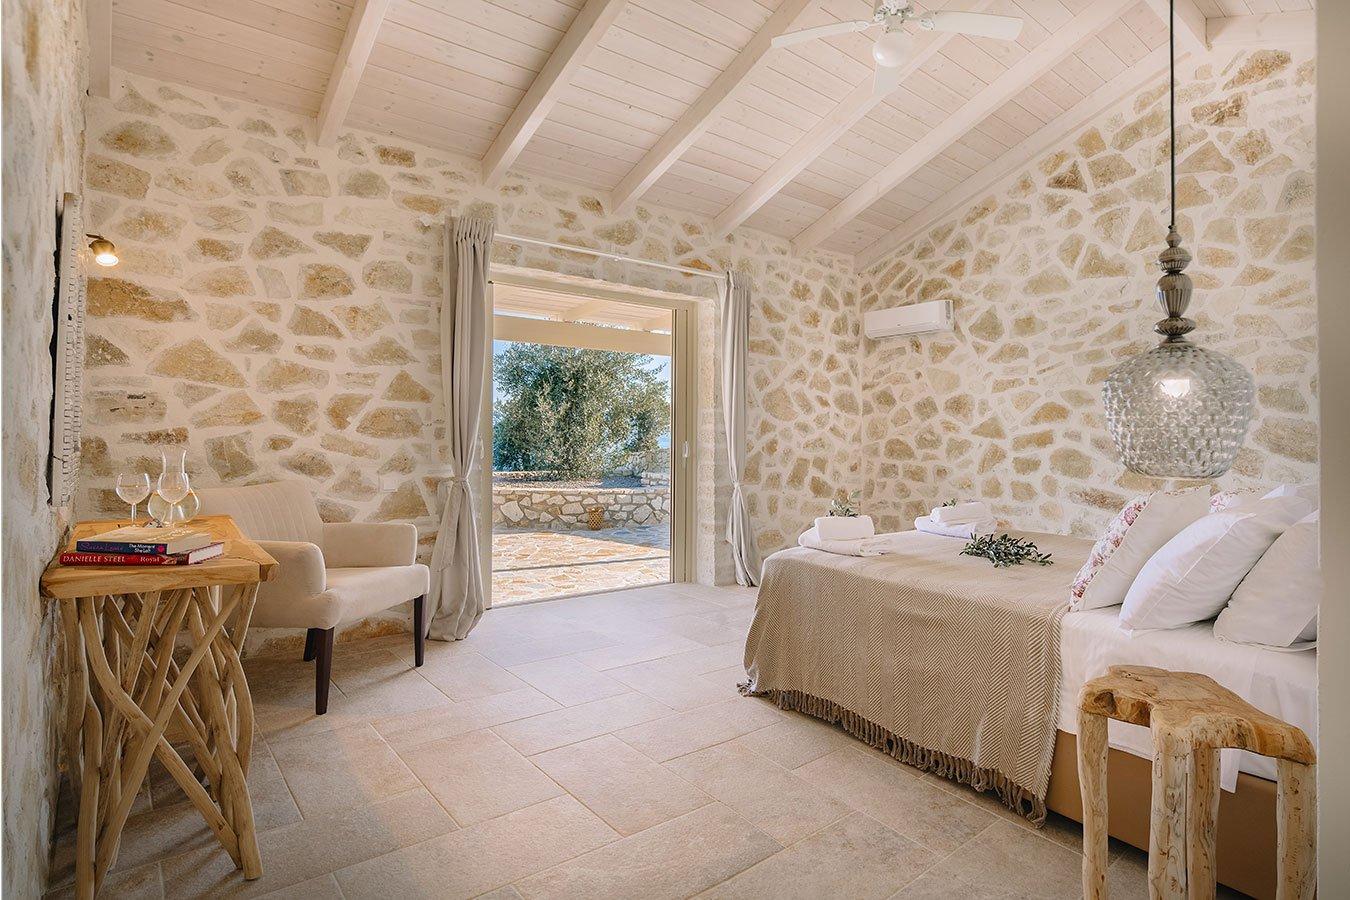 Sapfo Villa Paxos Bedroom View 3